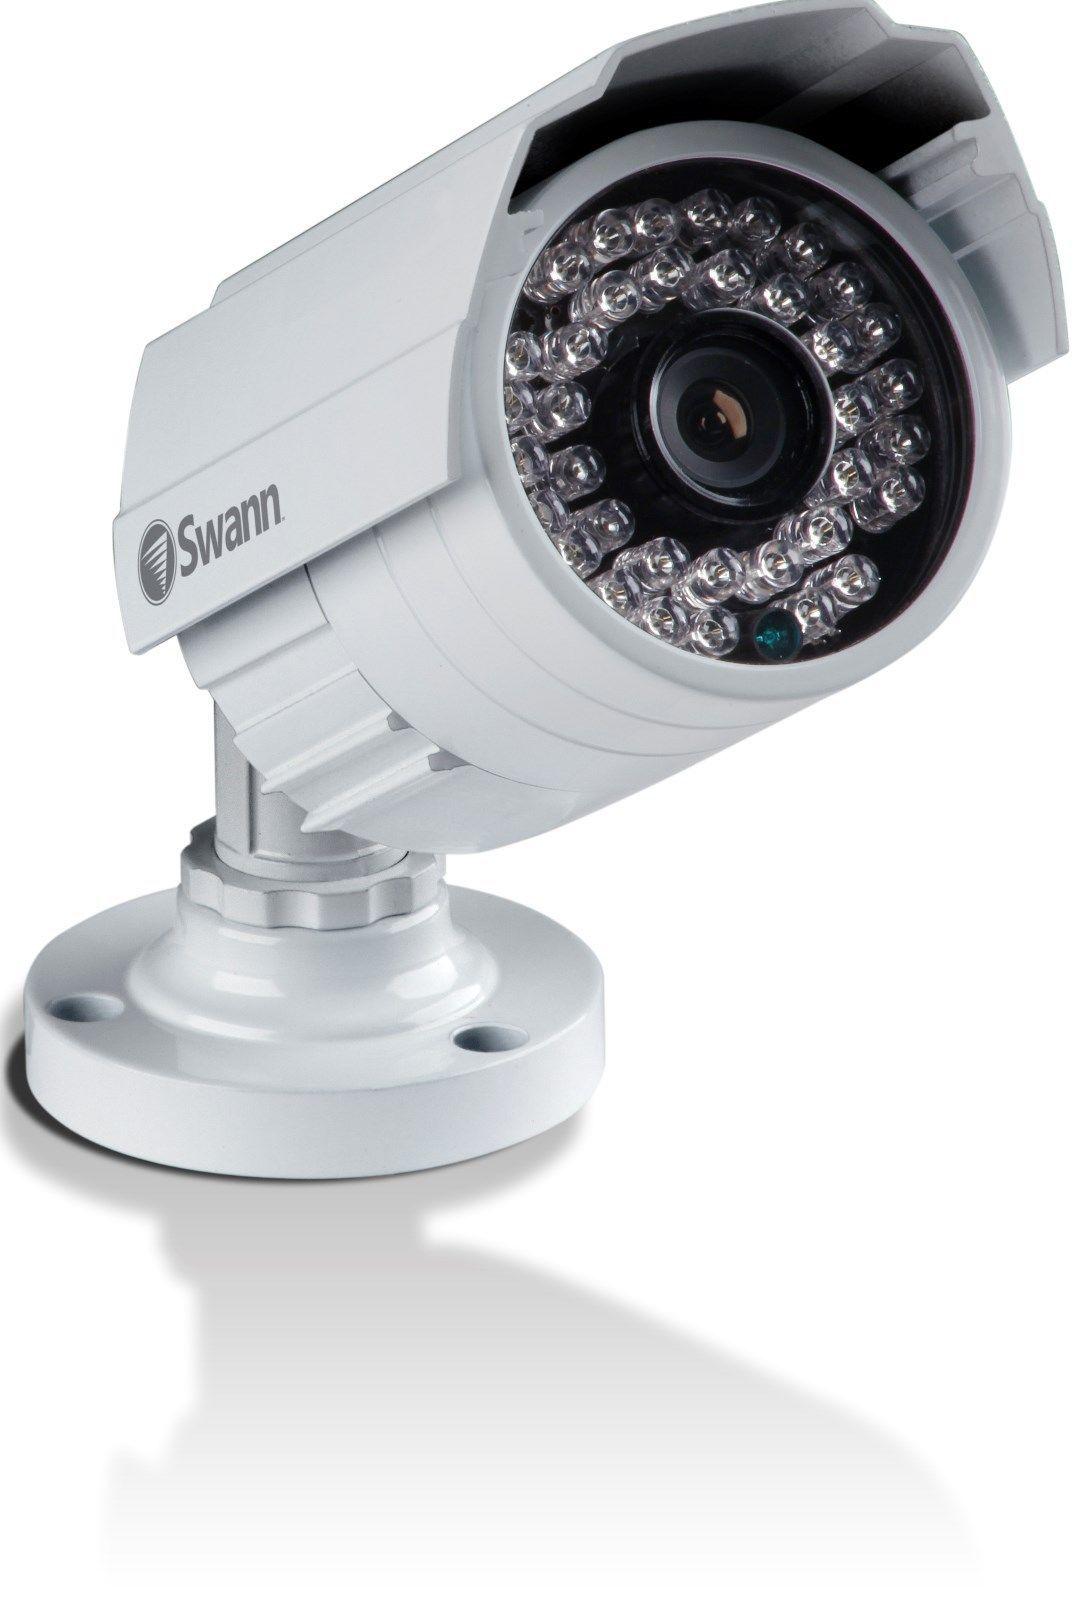 Swann SHD-870 Sdi 870 1080p Professional SDI Indoor Outdoor Cctv Security Camera